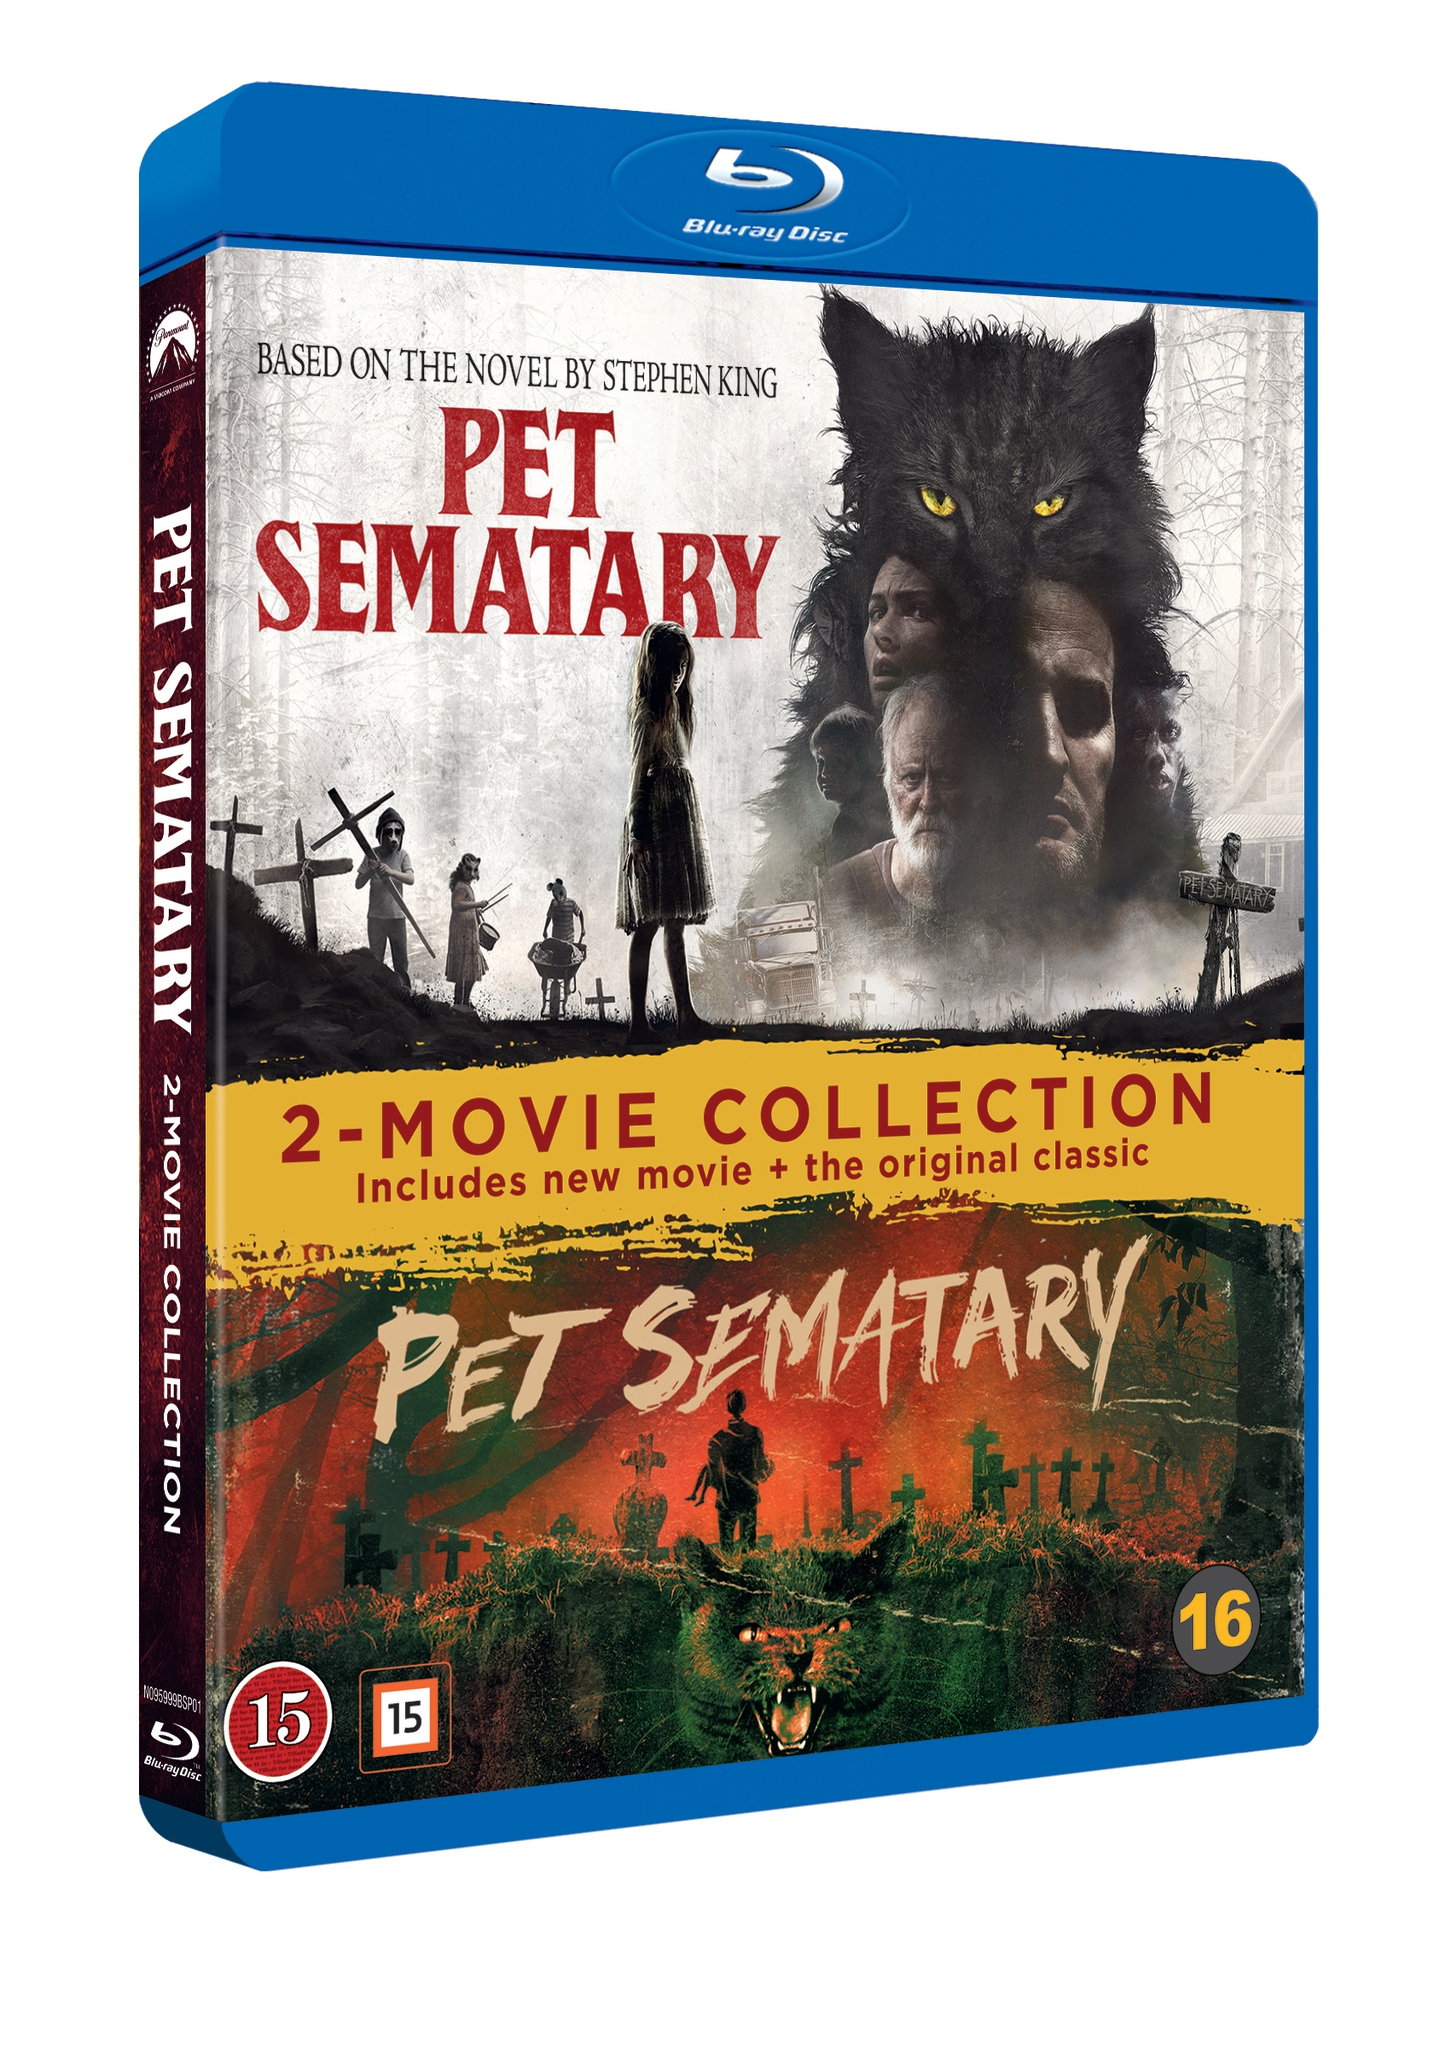 Pet Sematary 2-Movie Box